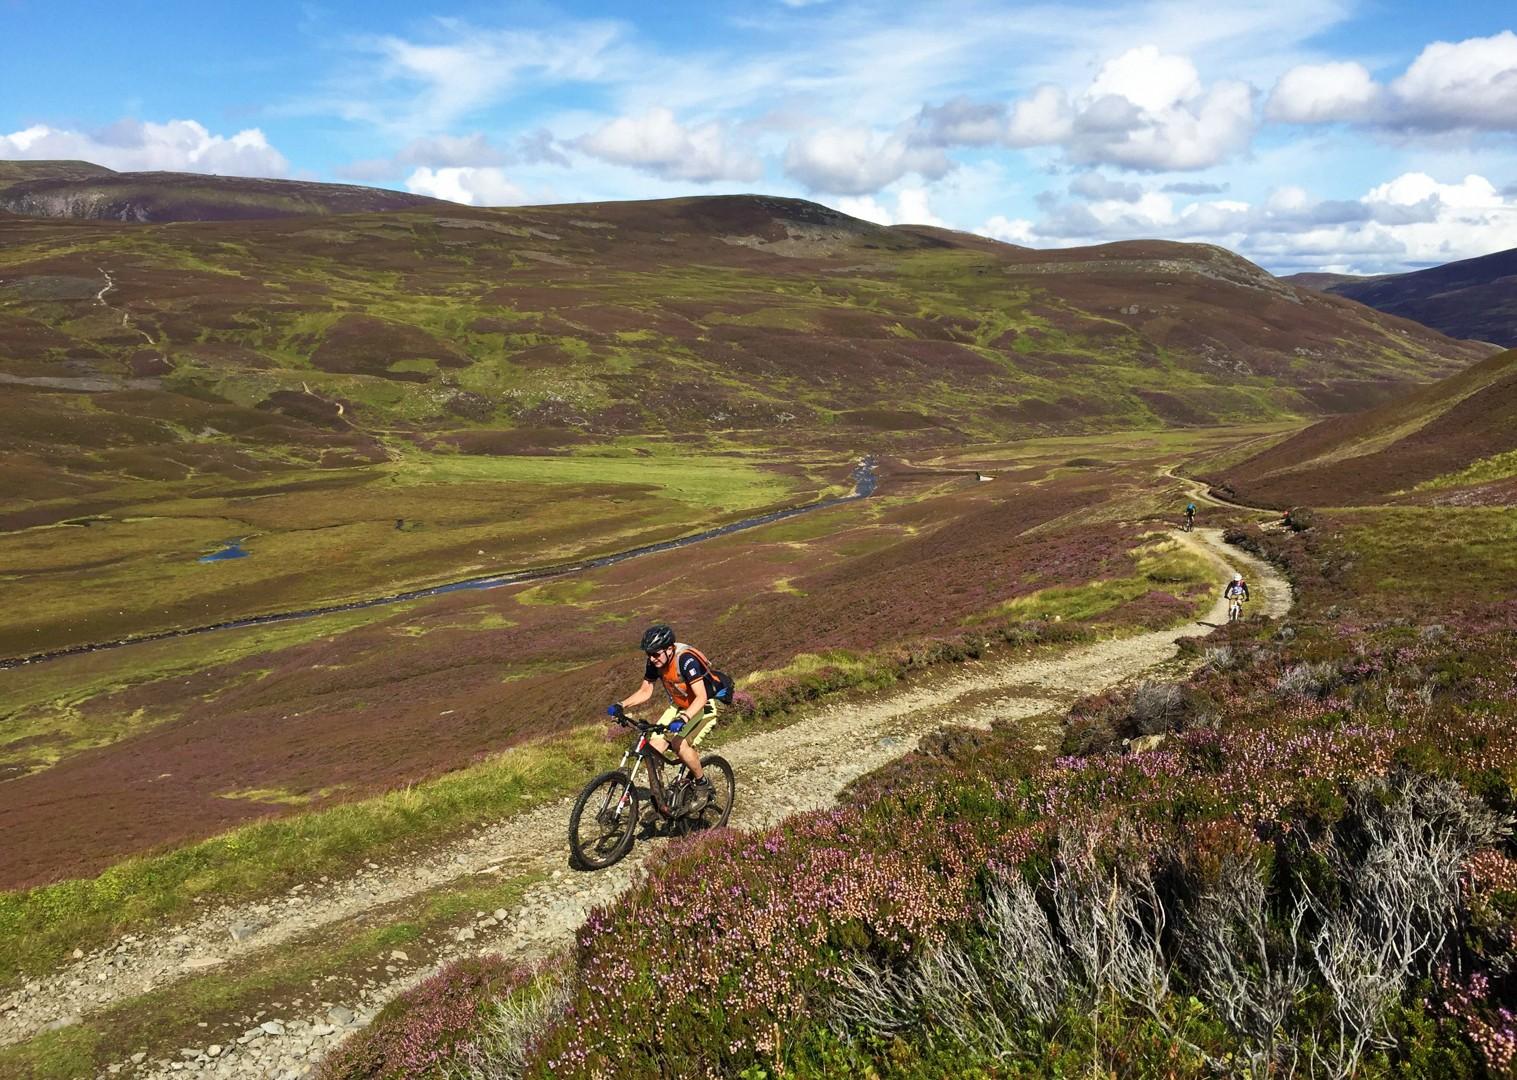 guided-mountain-biking-scotland-highlands.jpg - Scotland - Highlands Coast to Coast - Mountain Biking